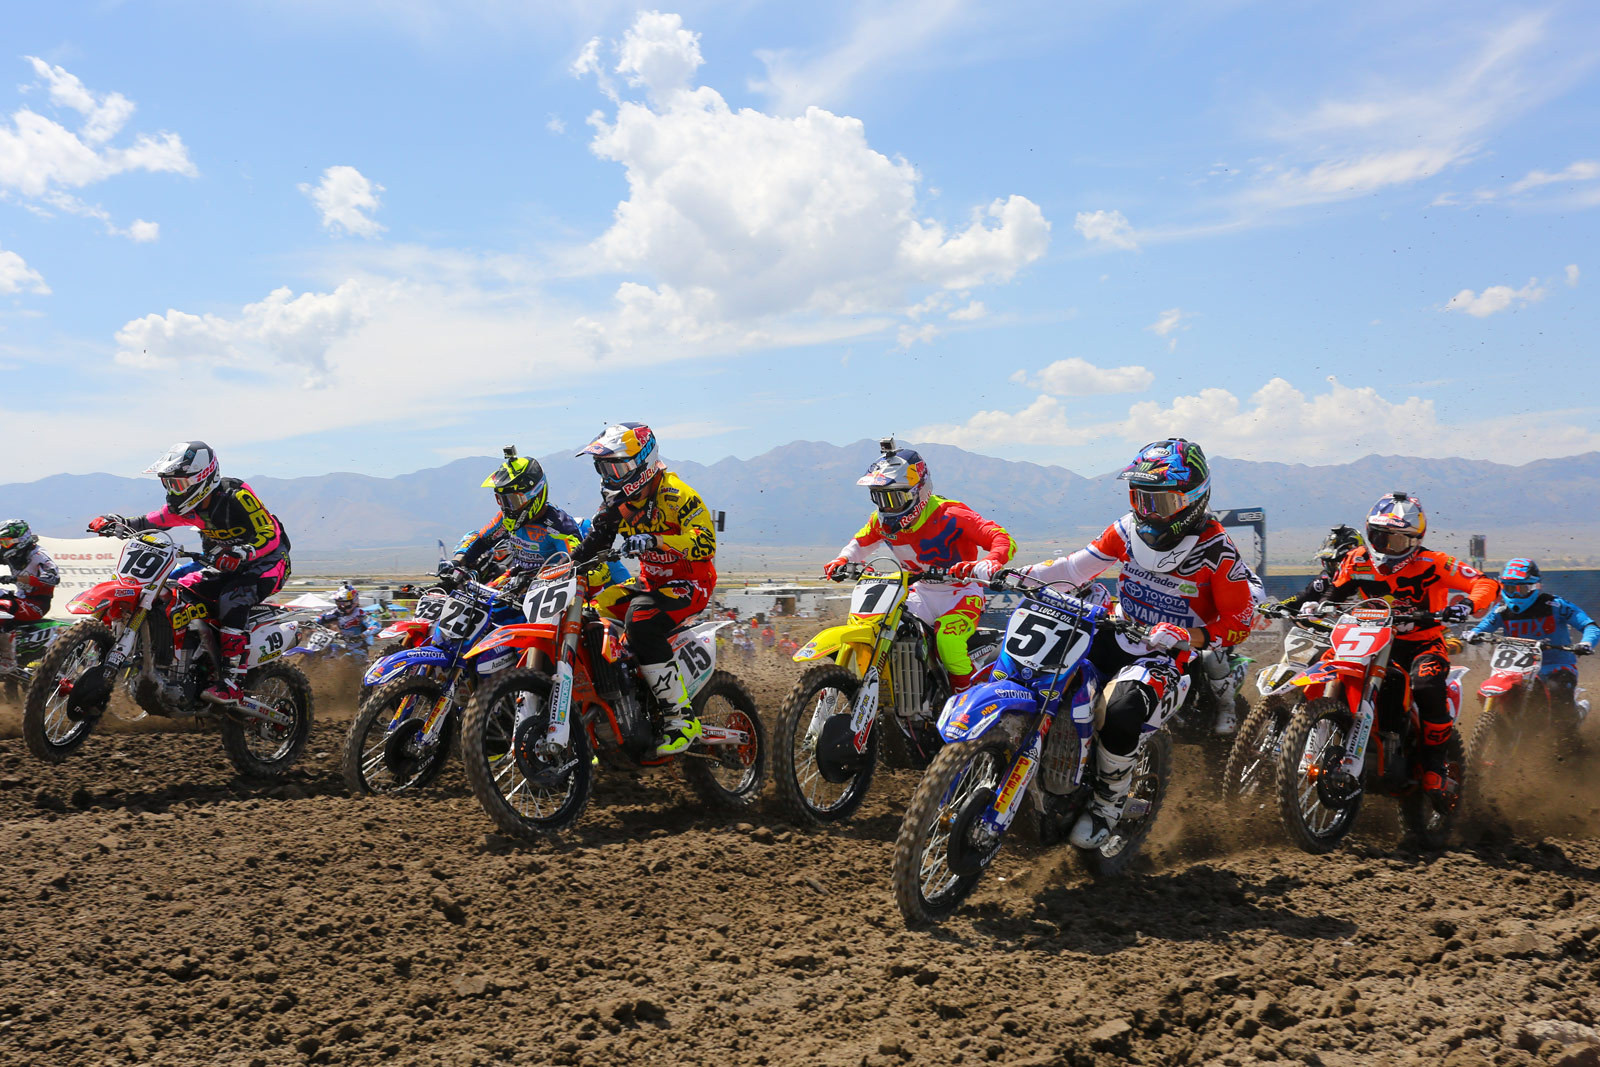 450 moto one start - Photo Blast: Miller Motorsports Park - Motocross Pictures - Vital MX